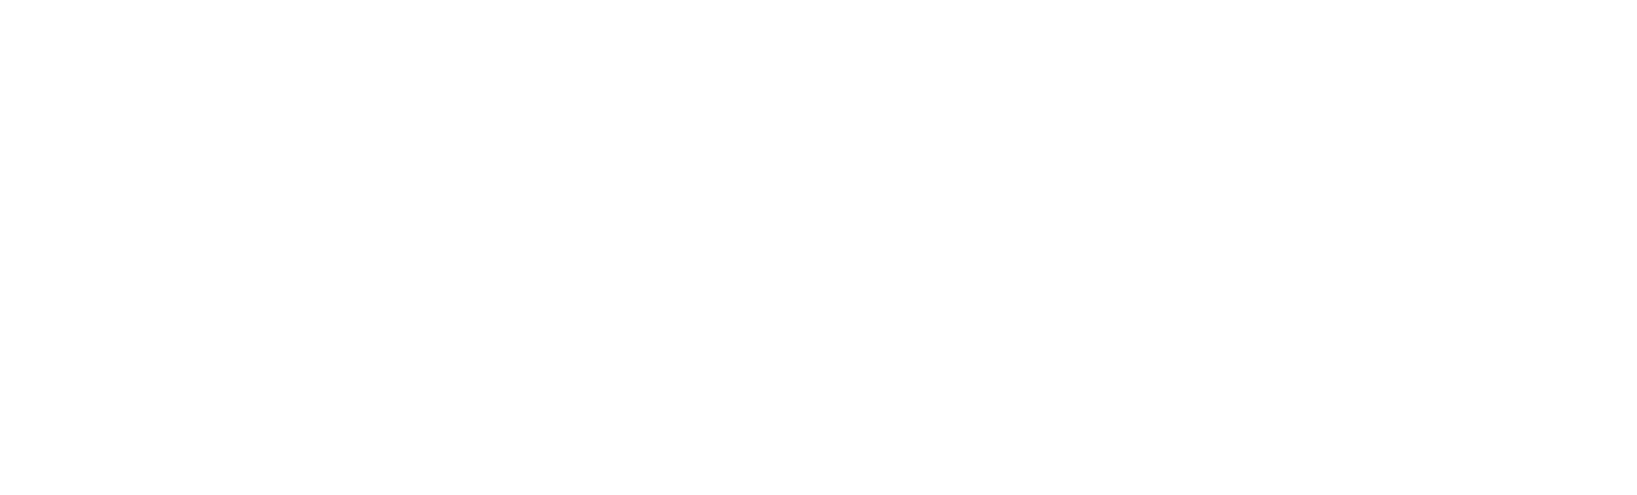 Per Falholt Global R&D Advisory Services